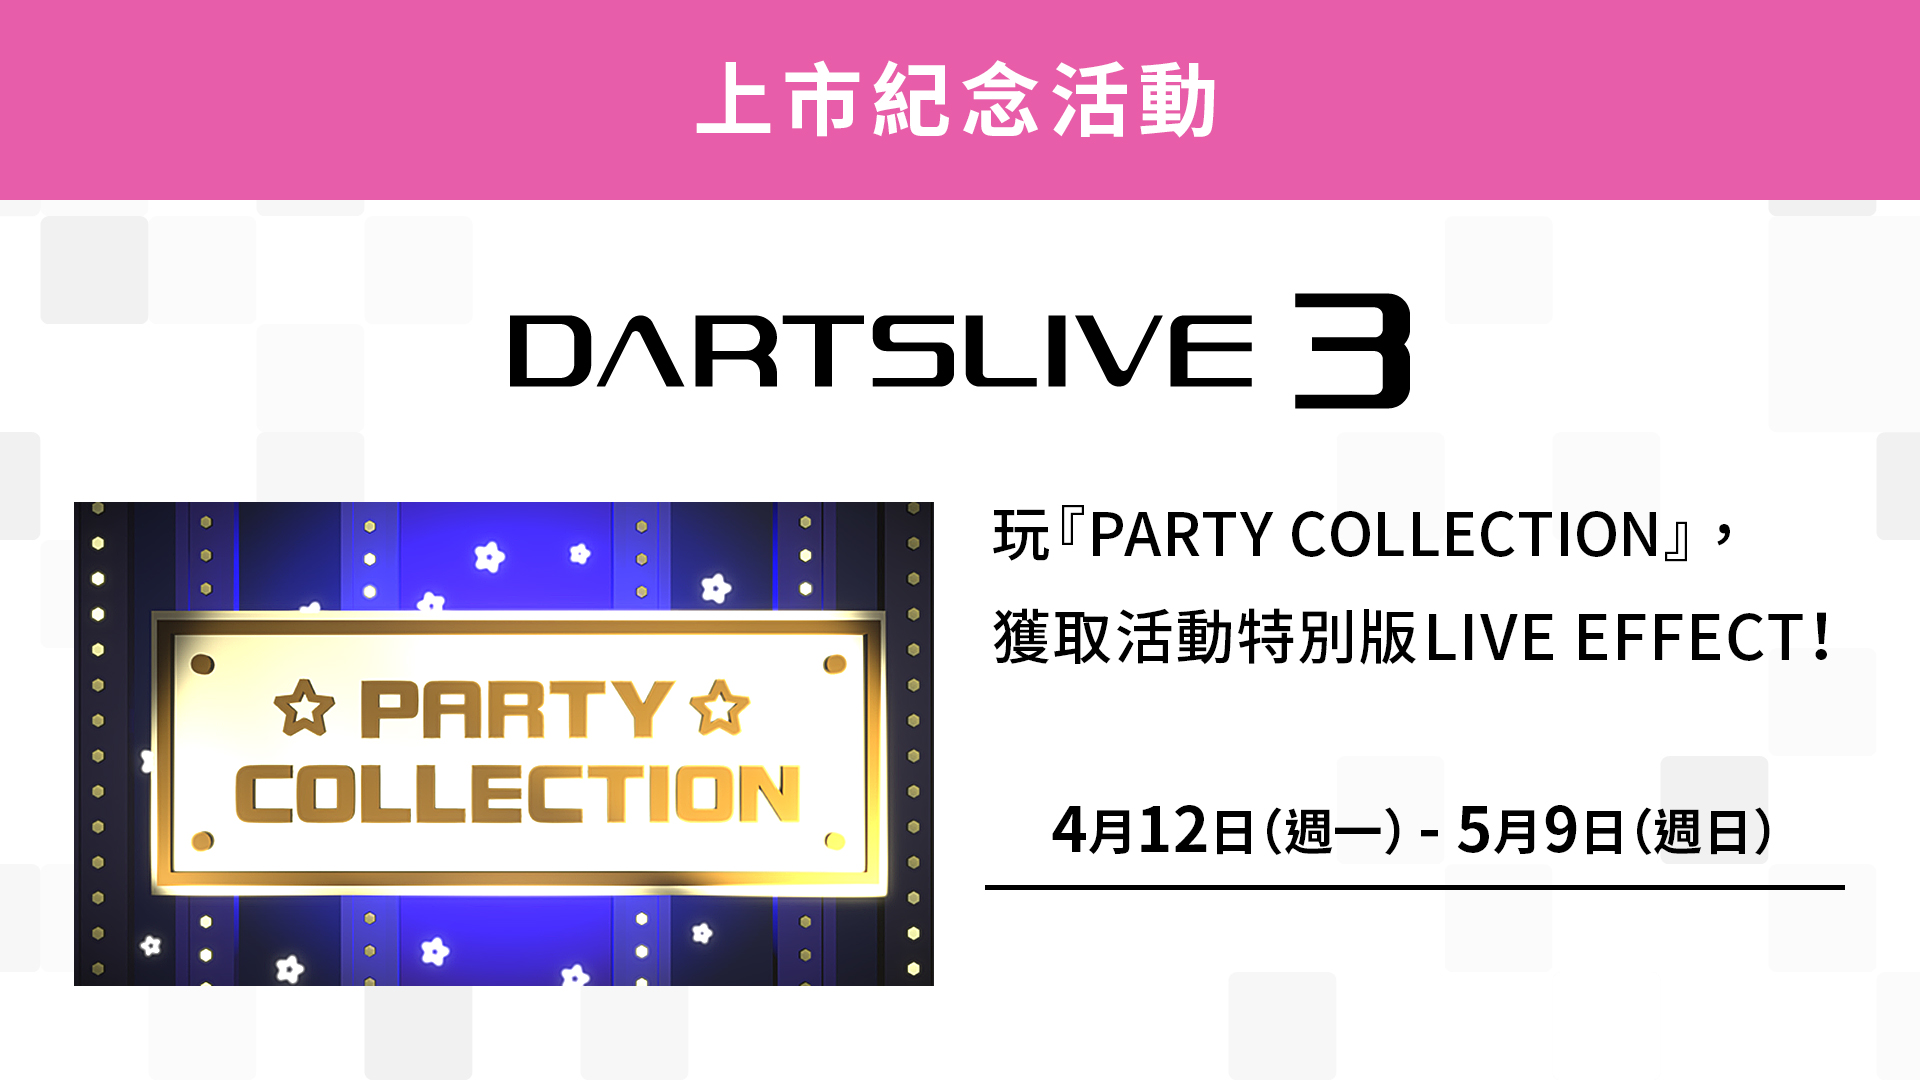 DARTSLIVE3上市紀念活動『PARTY COLLECTION』開始!